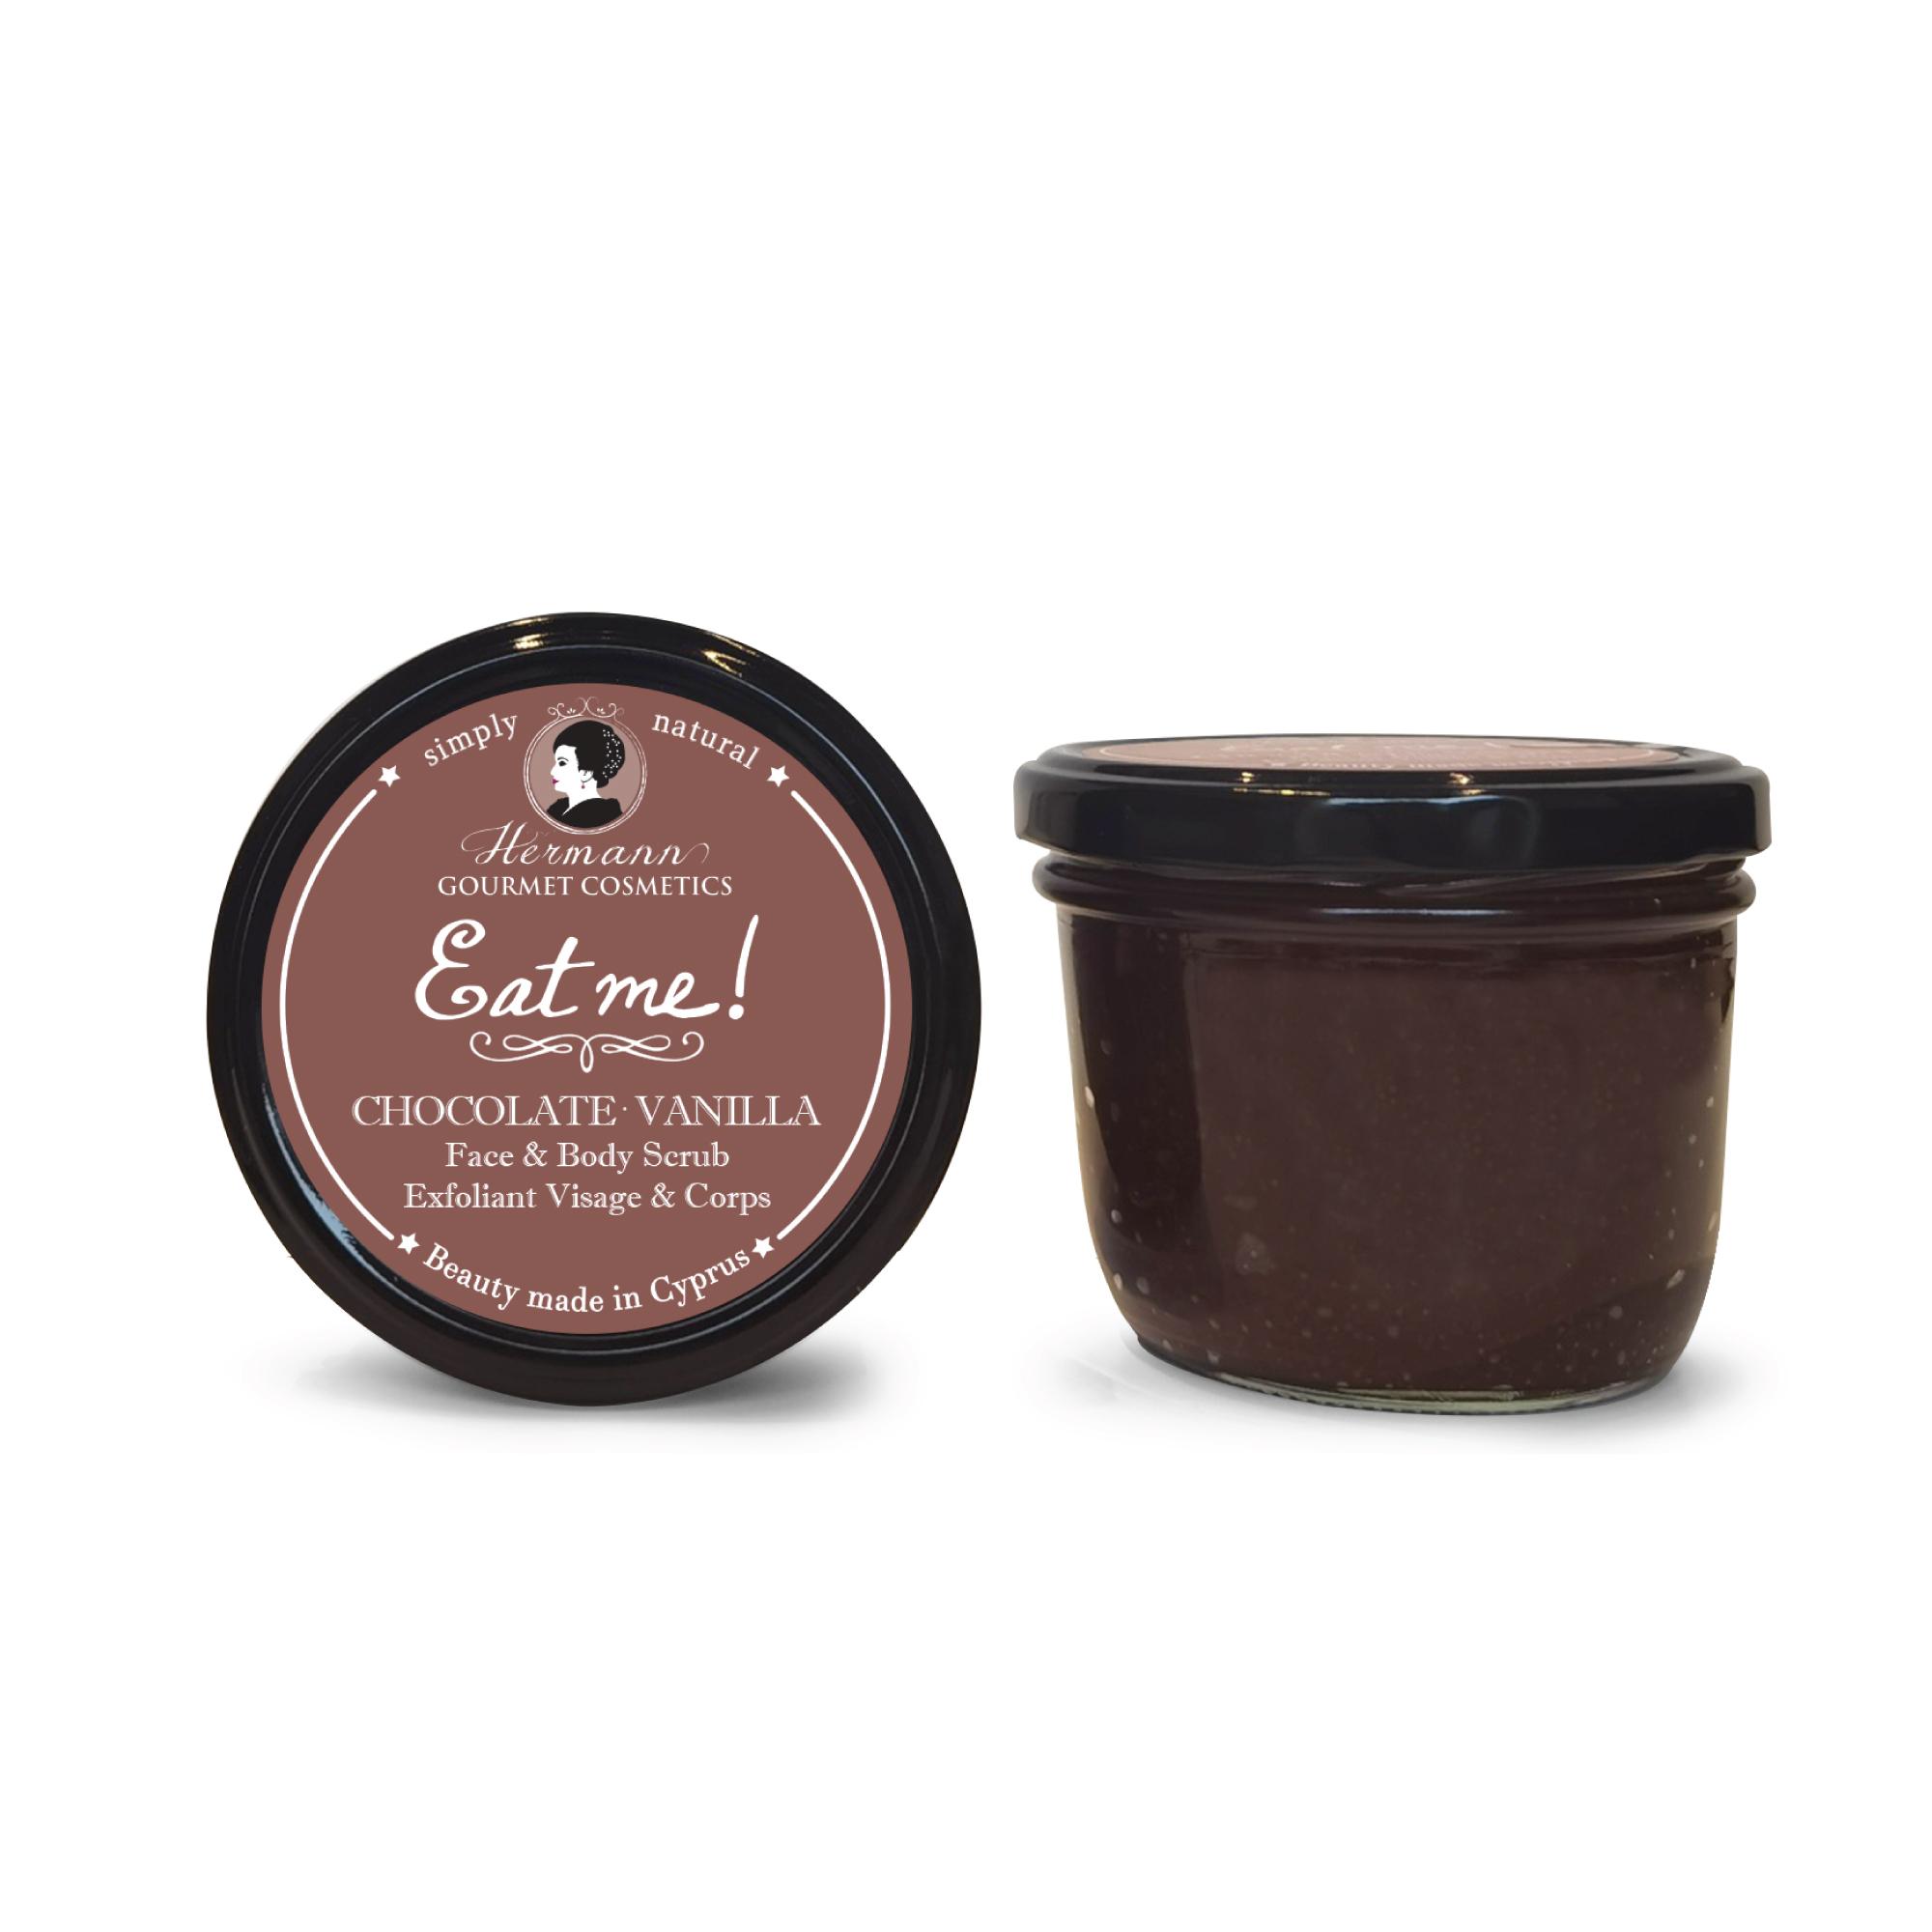 EAT ME Chocolate Vanilla Face & Body Scrub